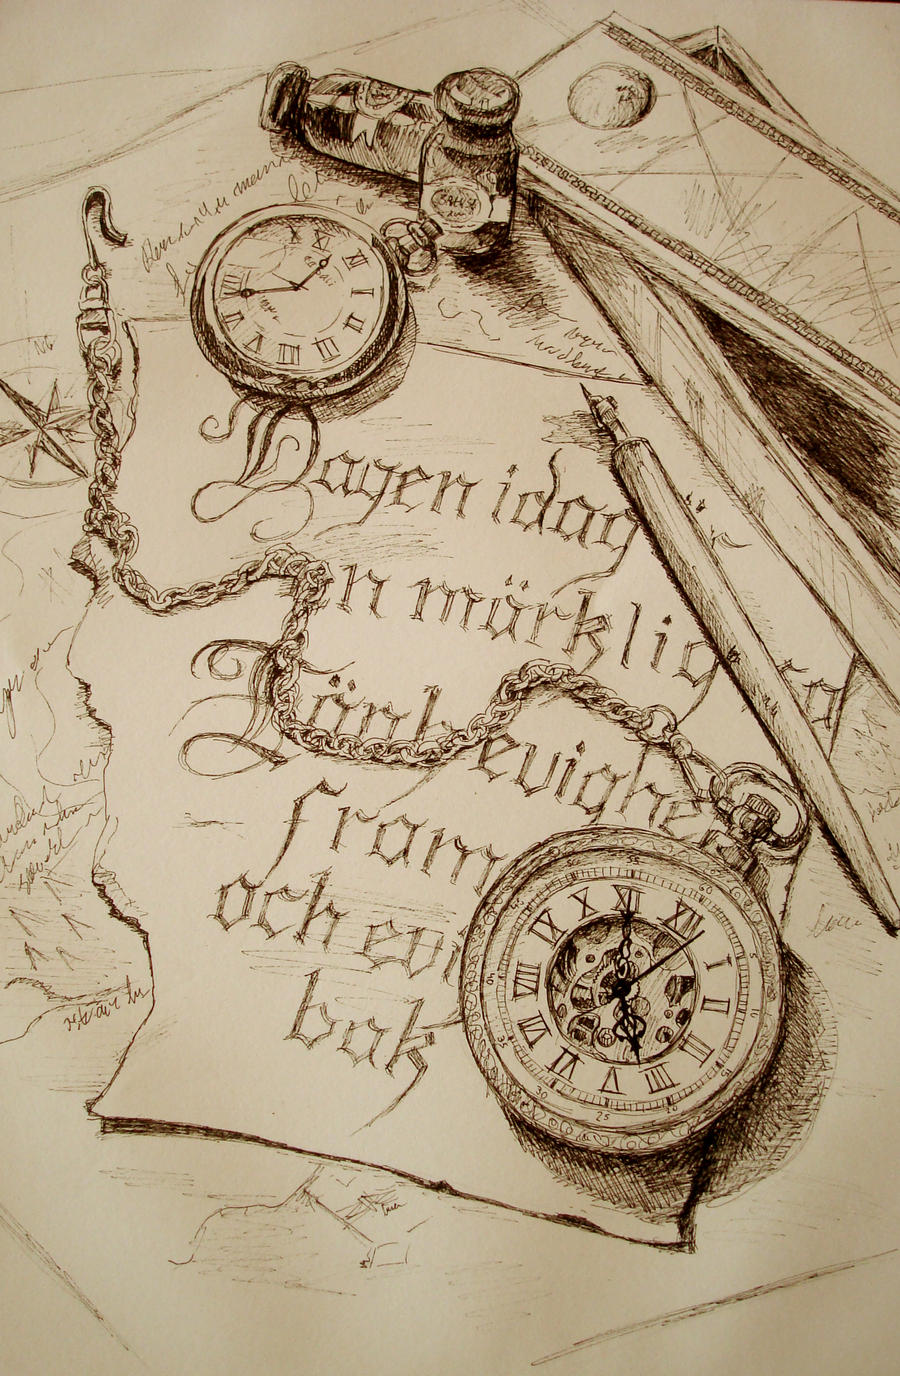 Sketch, pocket watch by Ulltotten on DeviantArt